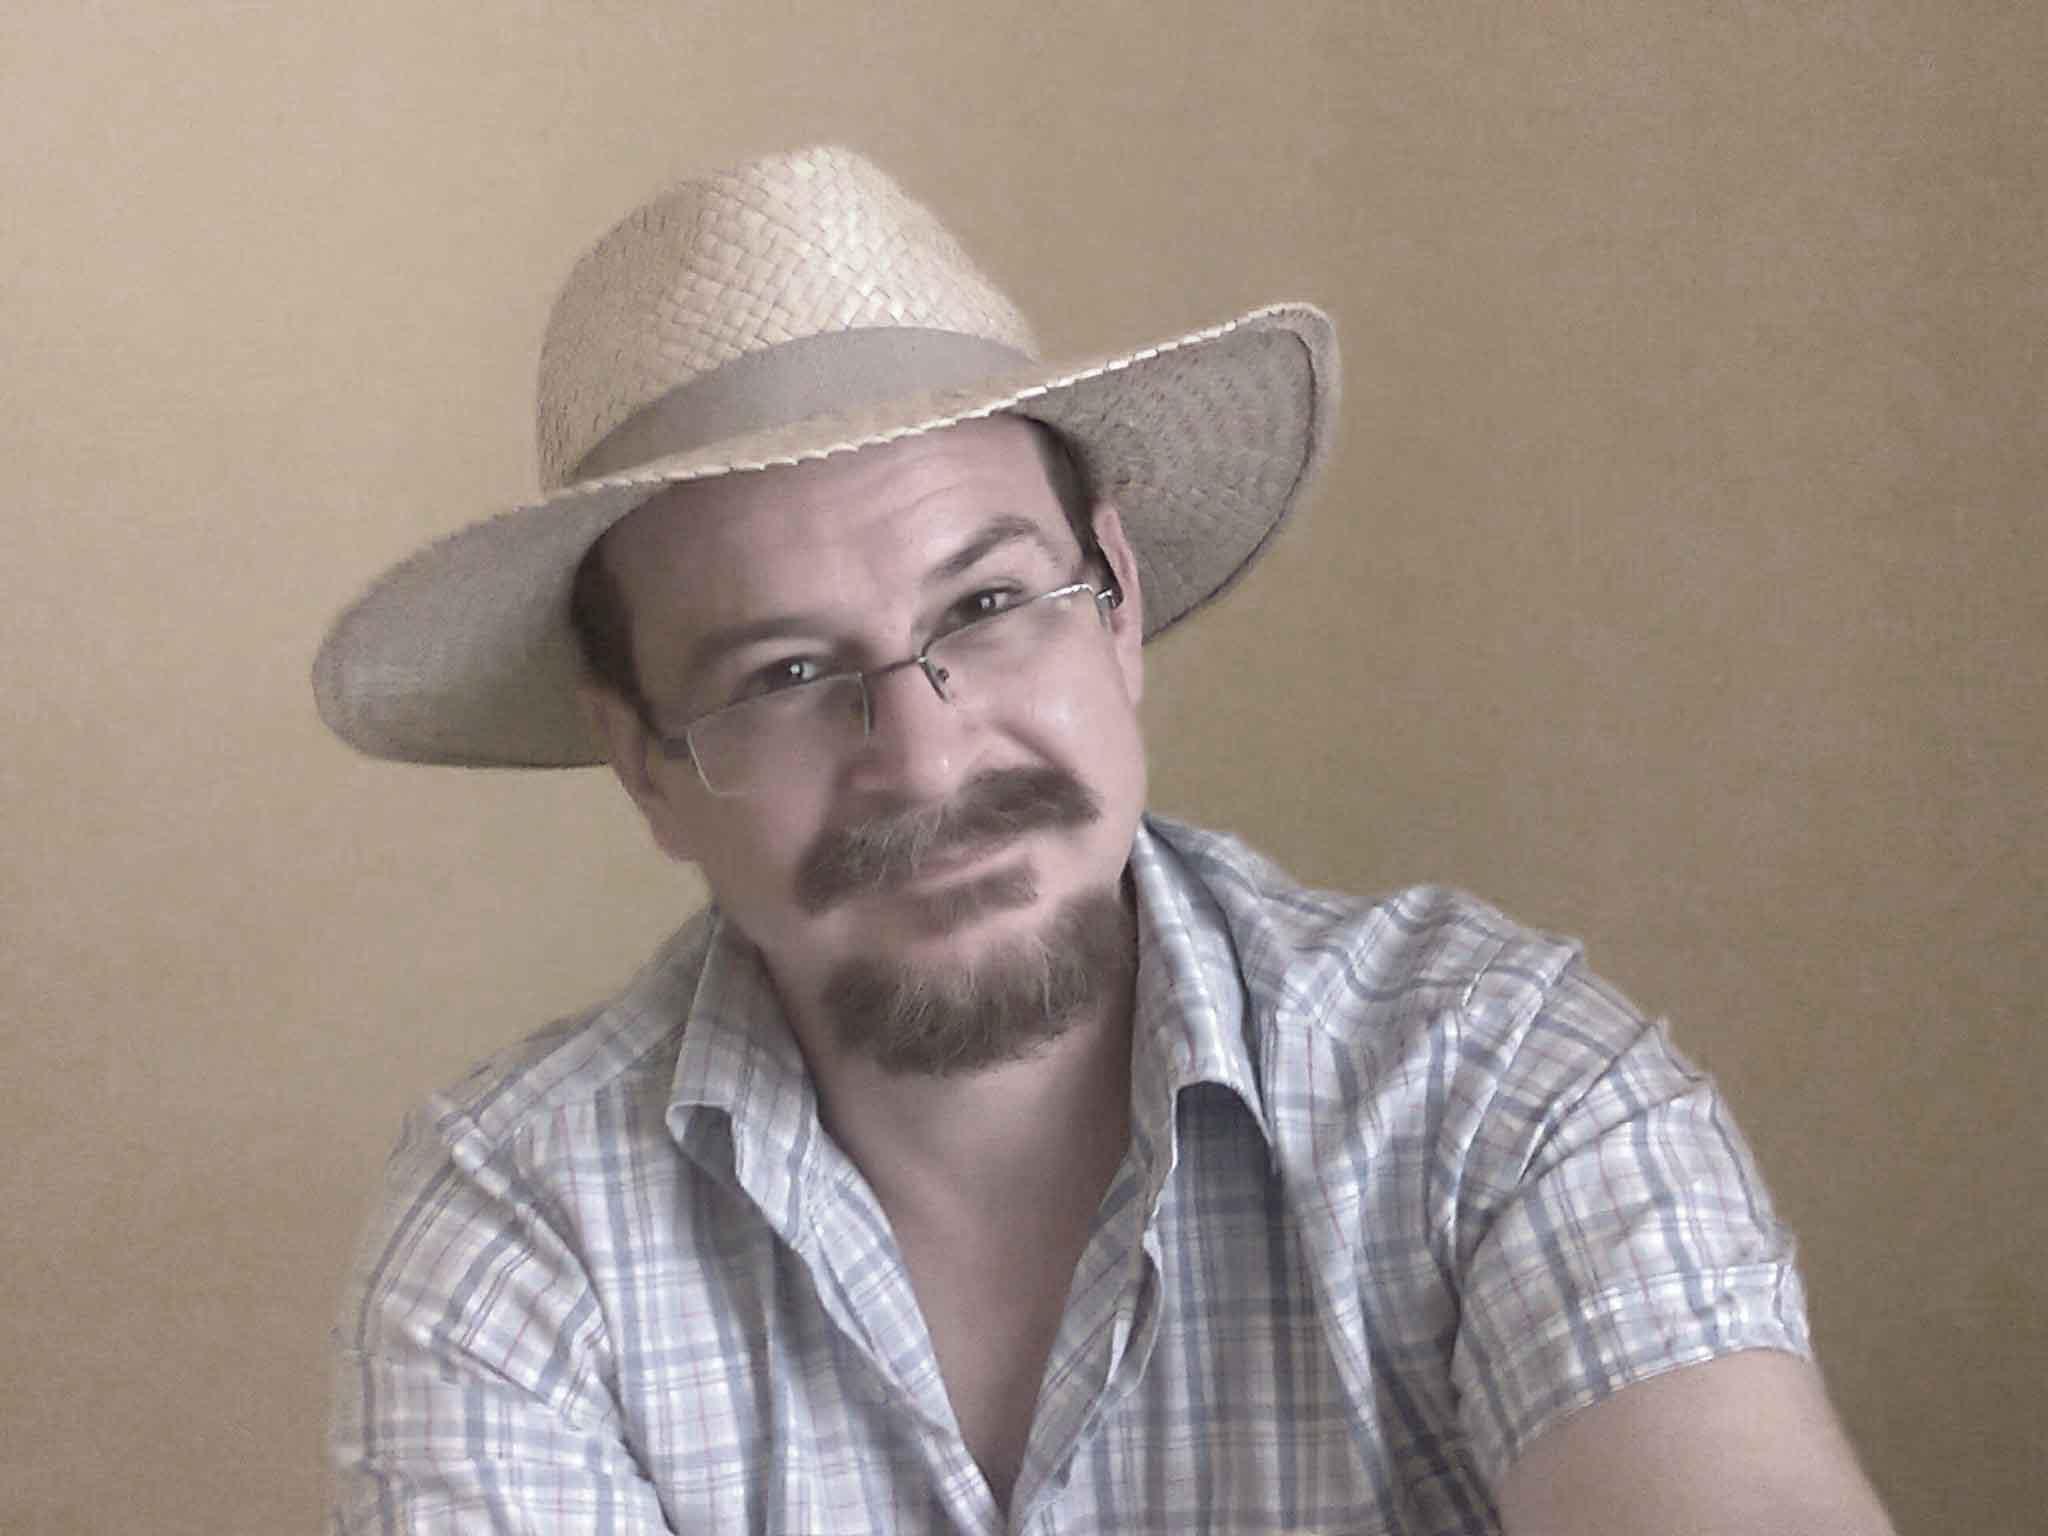 Krupa Freddy- Portret slikara